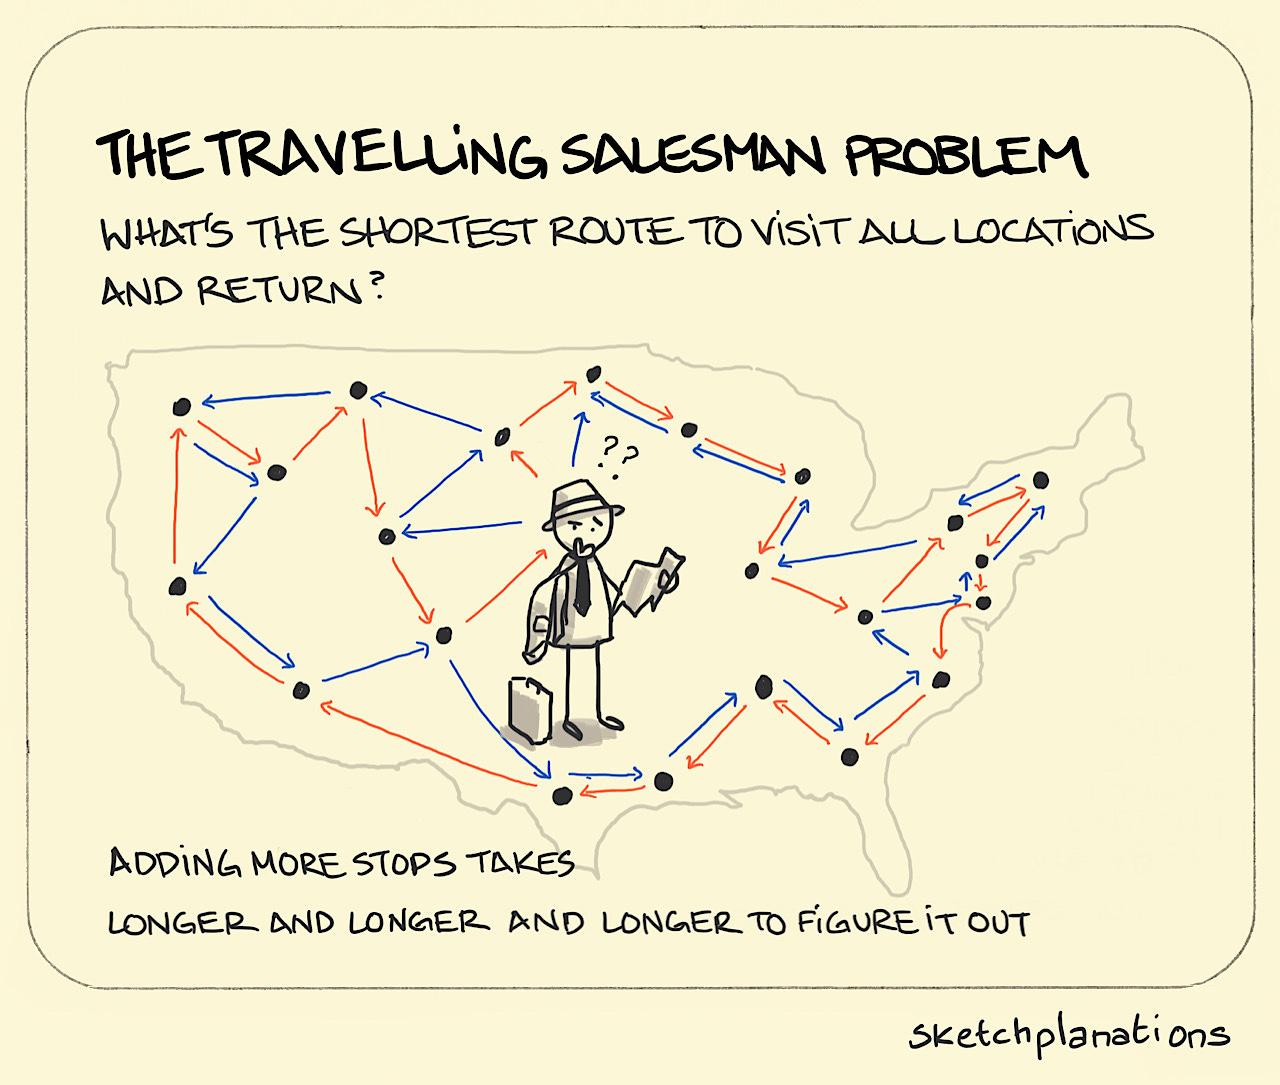 The travelling salesman problem - Sketchplanations